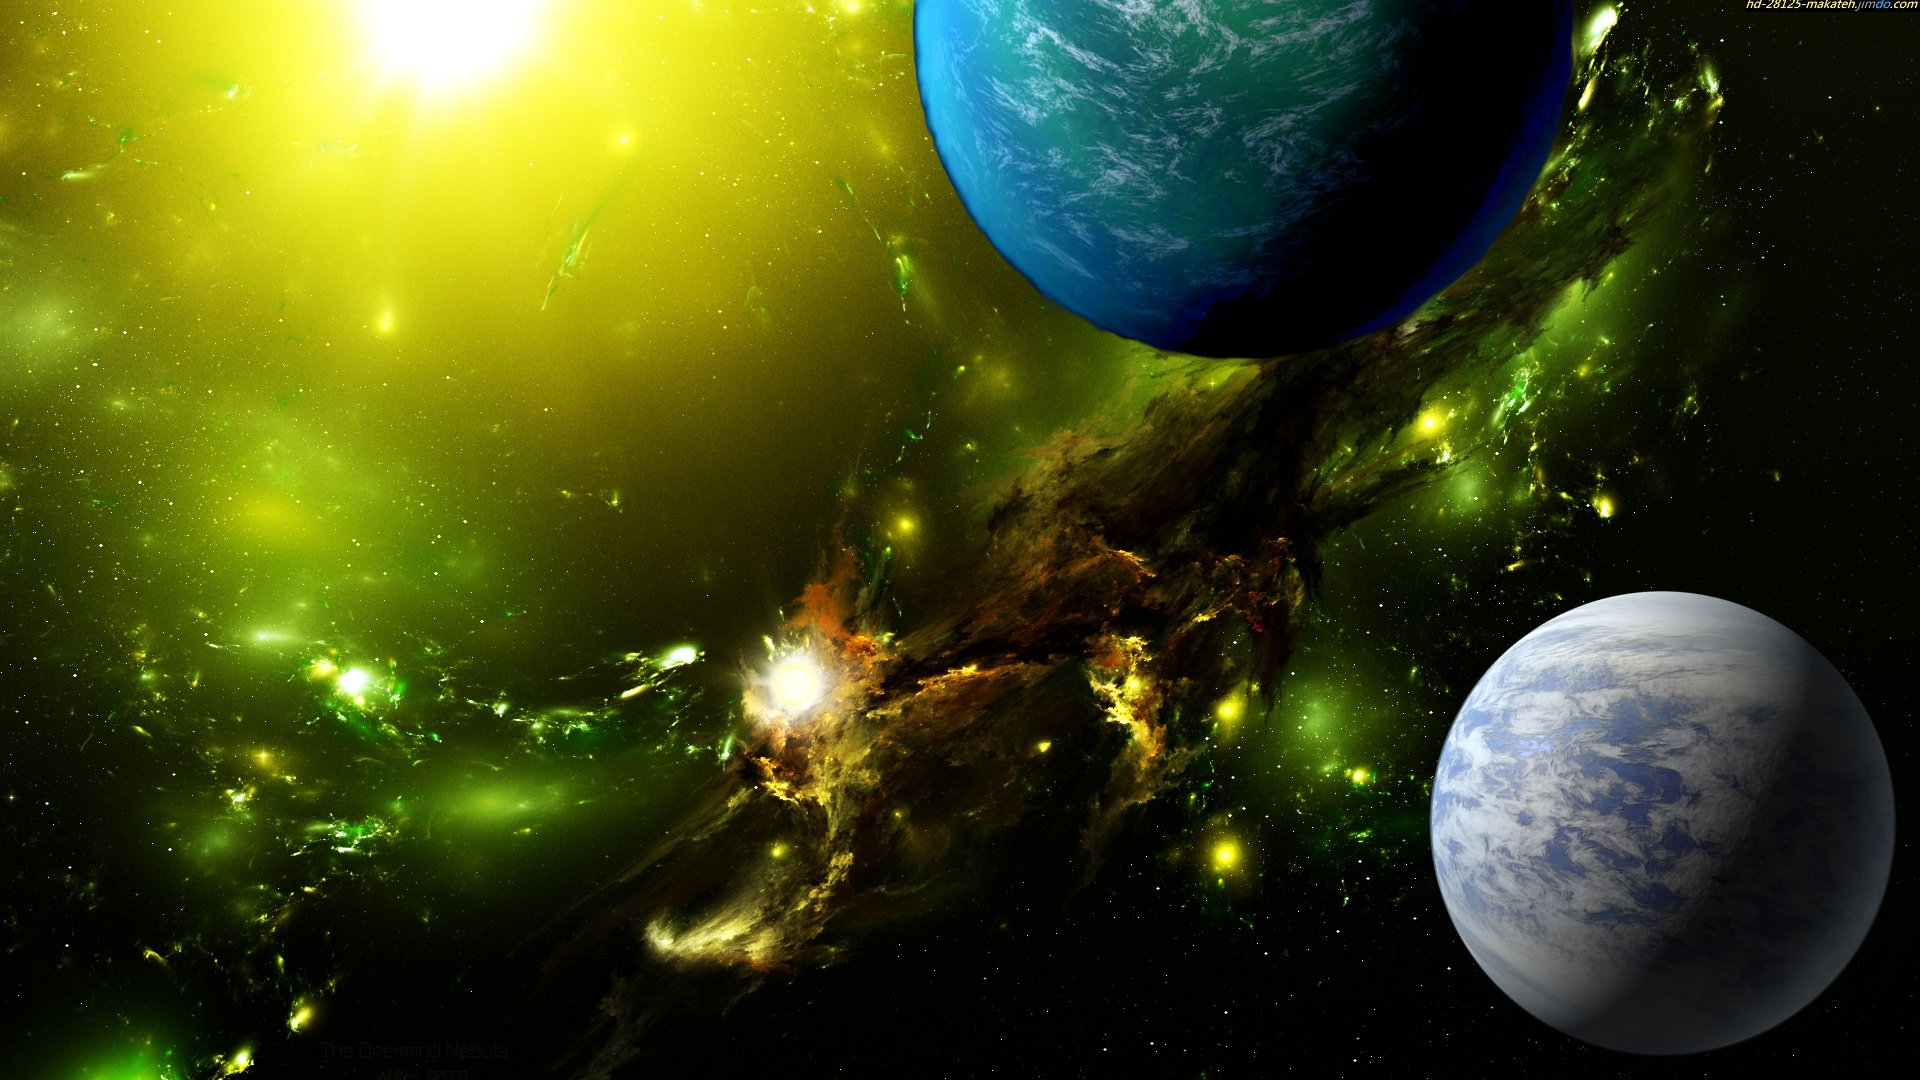 Exoplanets Computer Wallpapers, Desktop Backgrounds ...